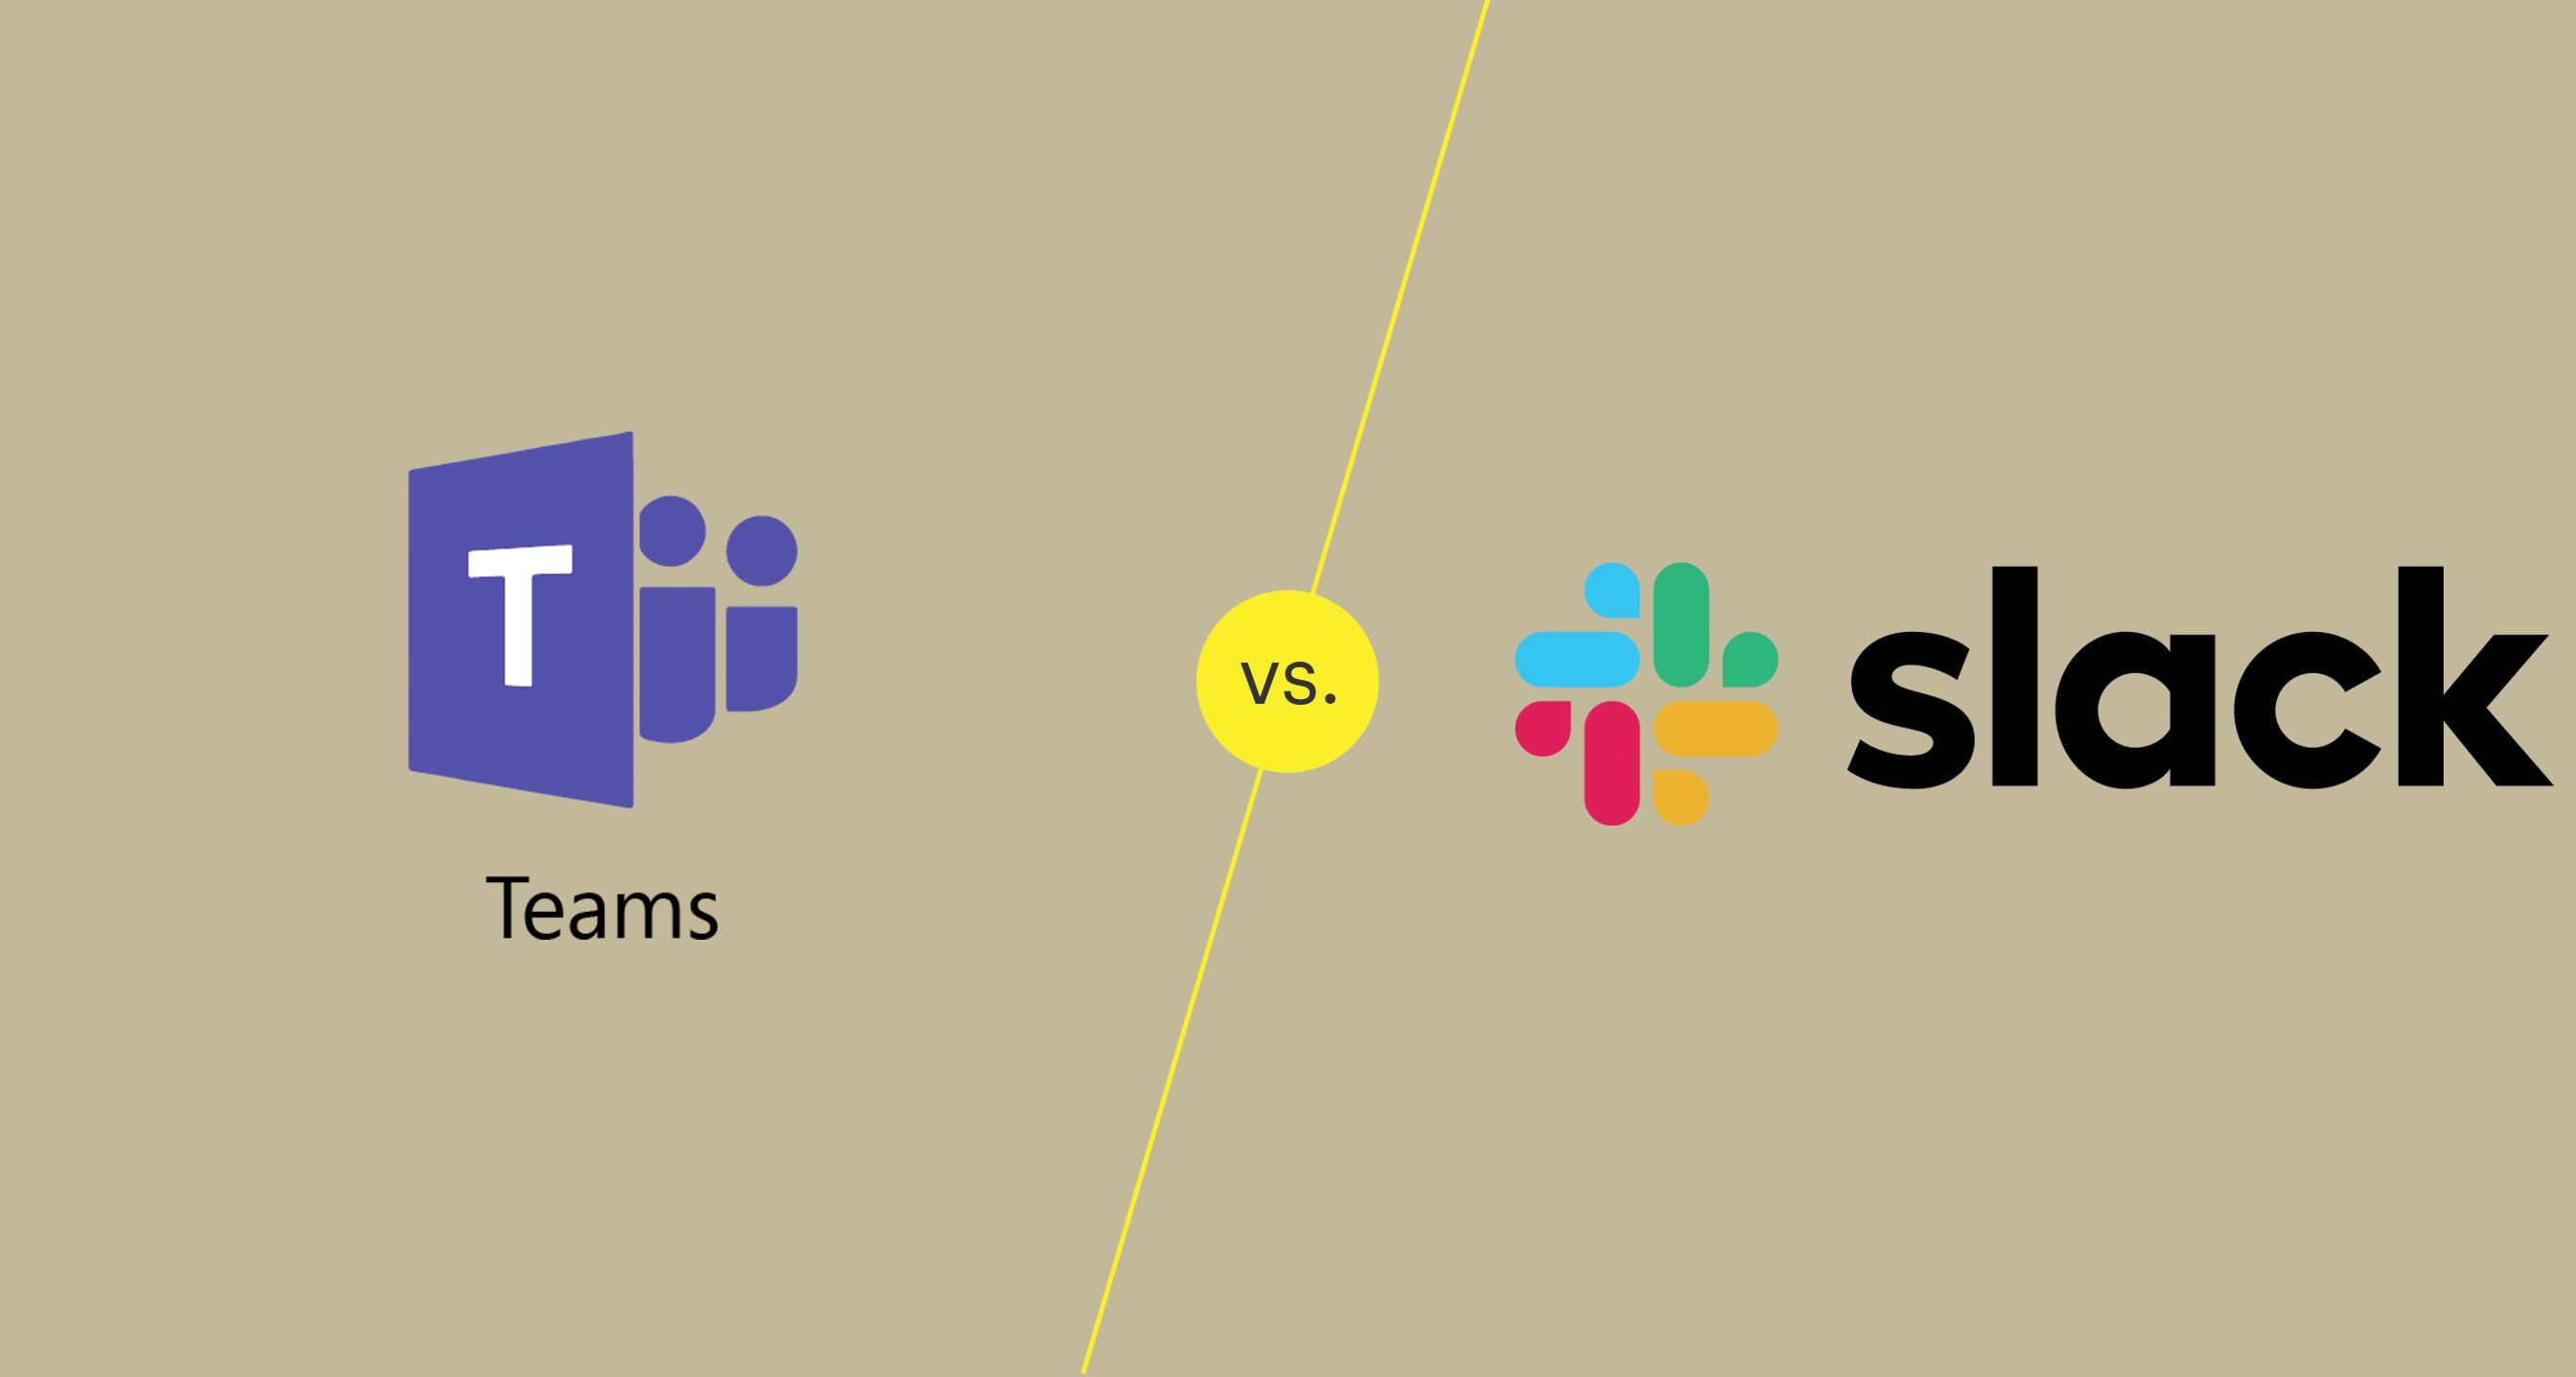 An illustration of Microsoft Teams versus Slack